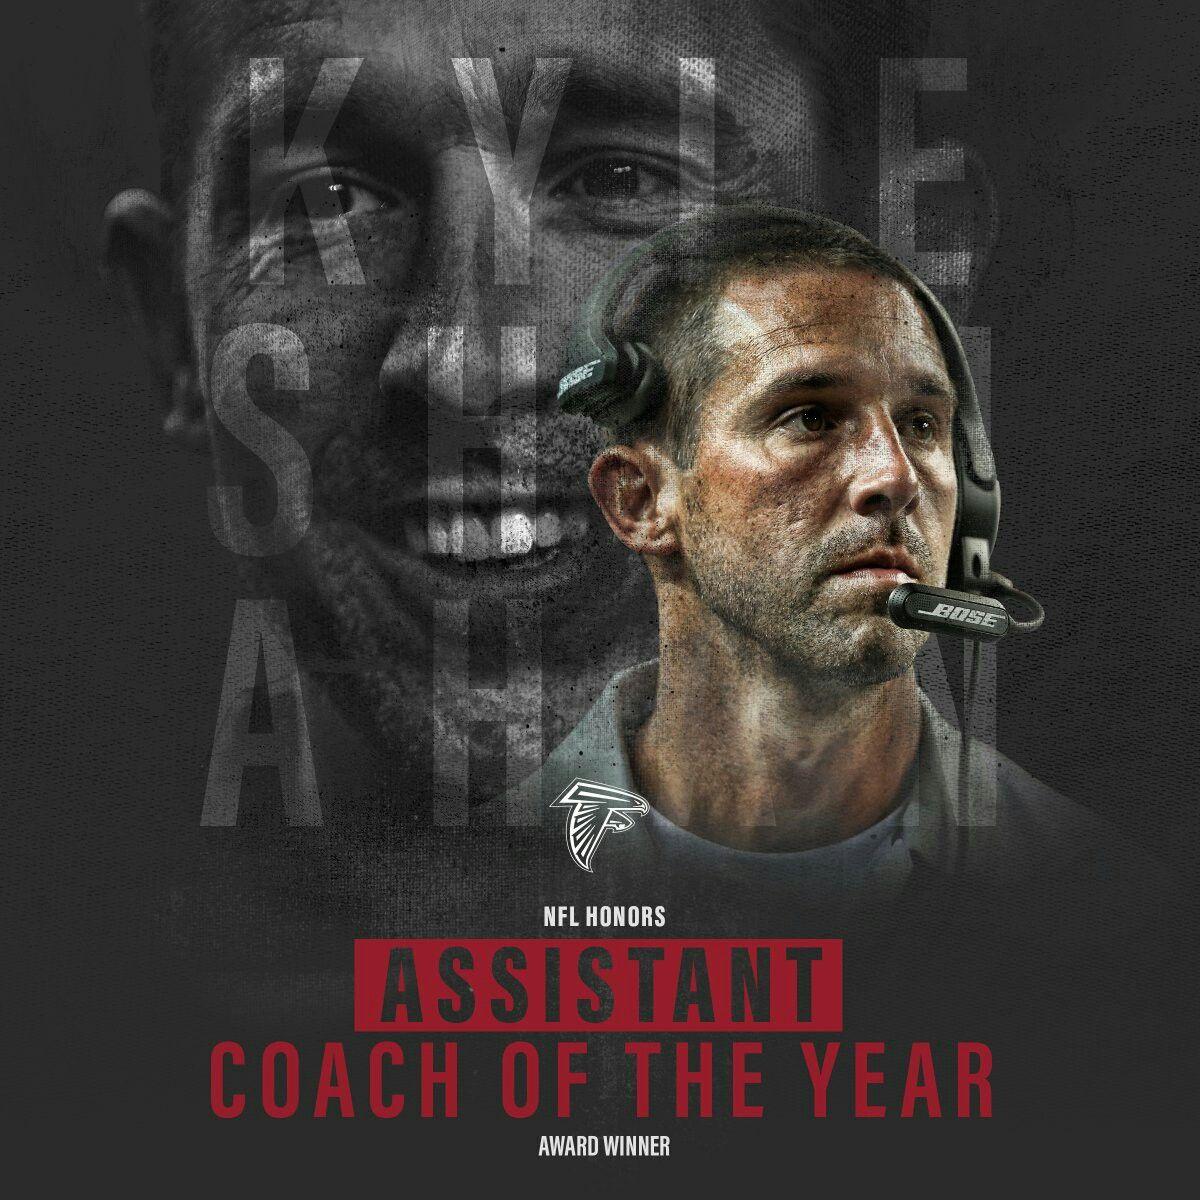 Kyle Shanahan Named 2016 Assistant Coach Of The Year Via Atlantafalcons On Twitter Atlanta Falcons Football Atlanta Falcons Quotes Atlanta Falcons Memes